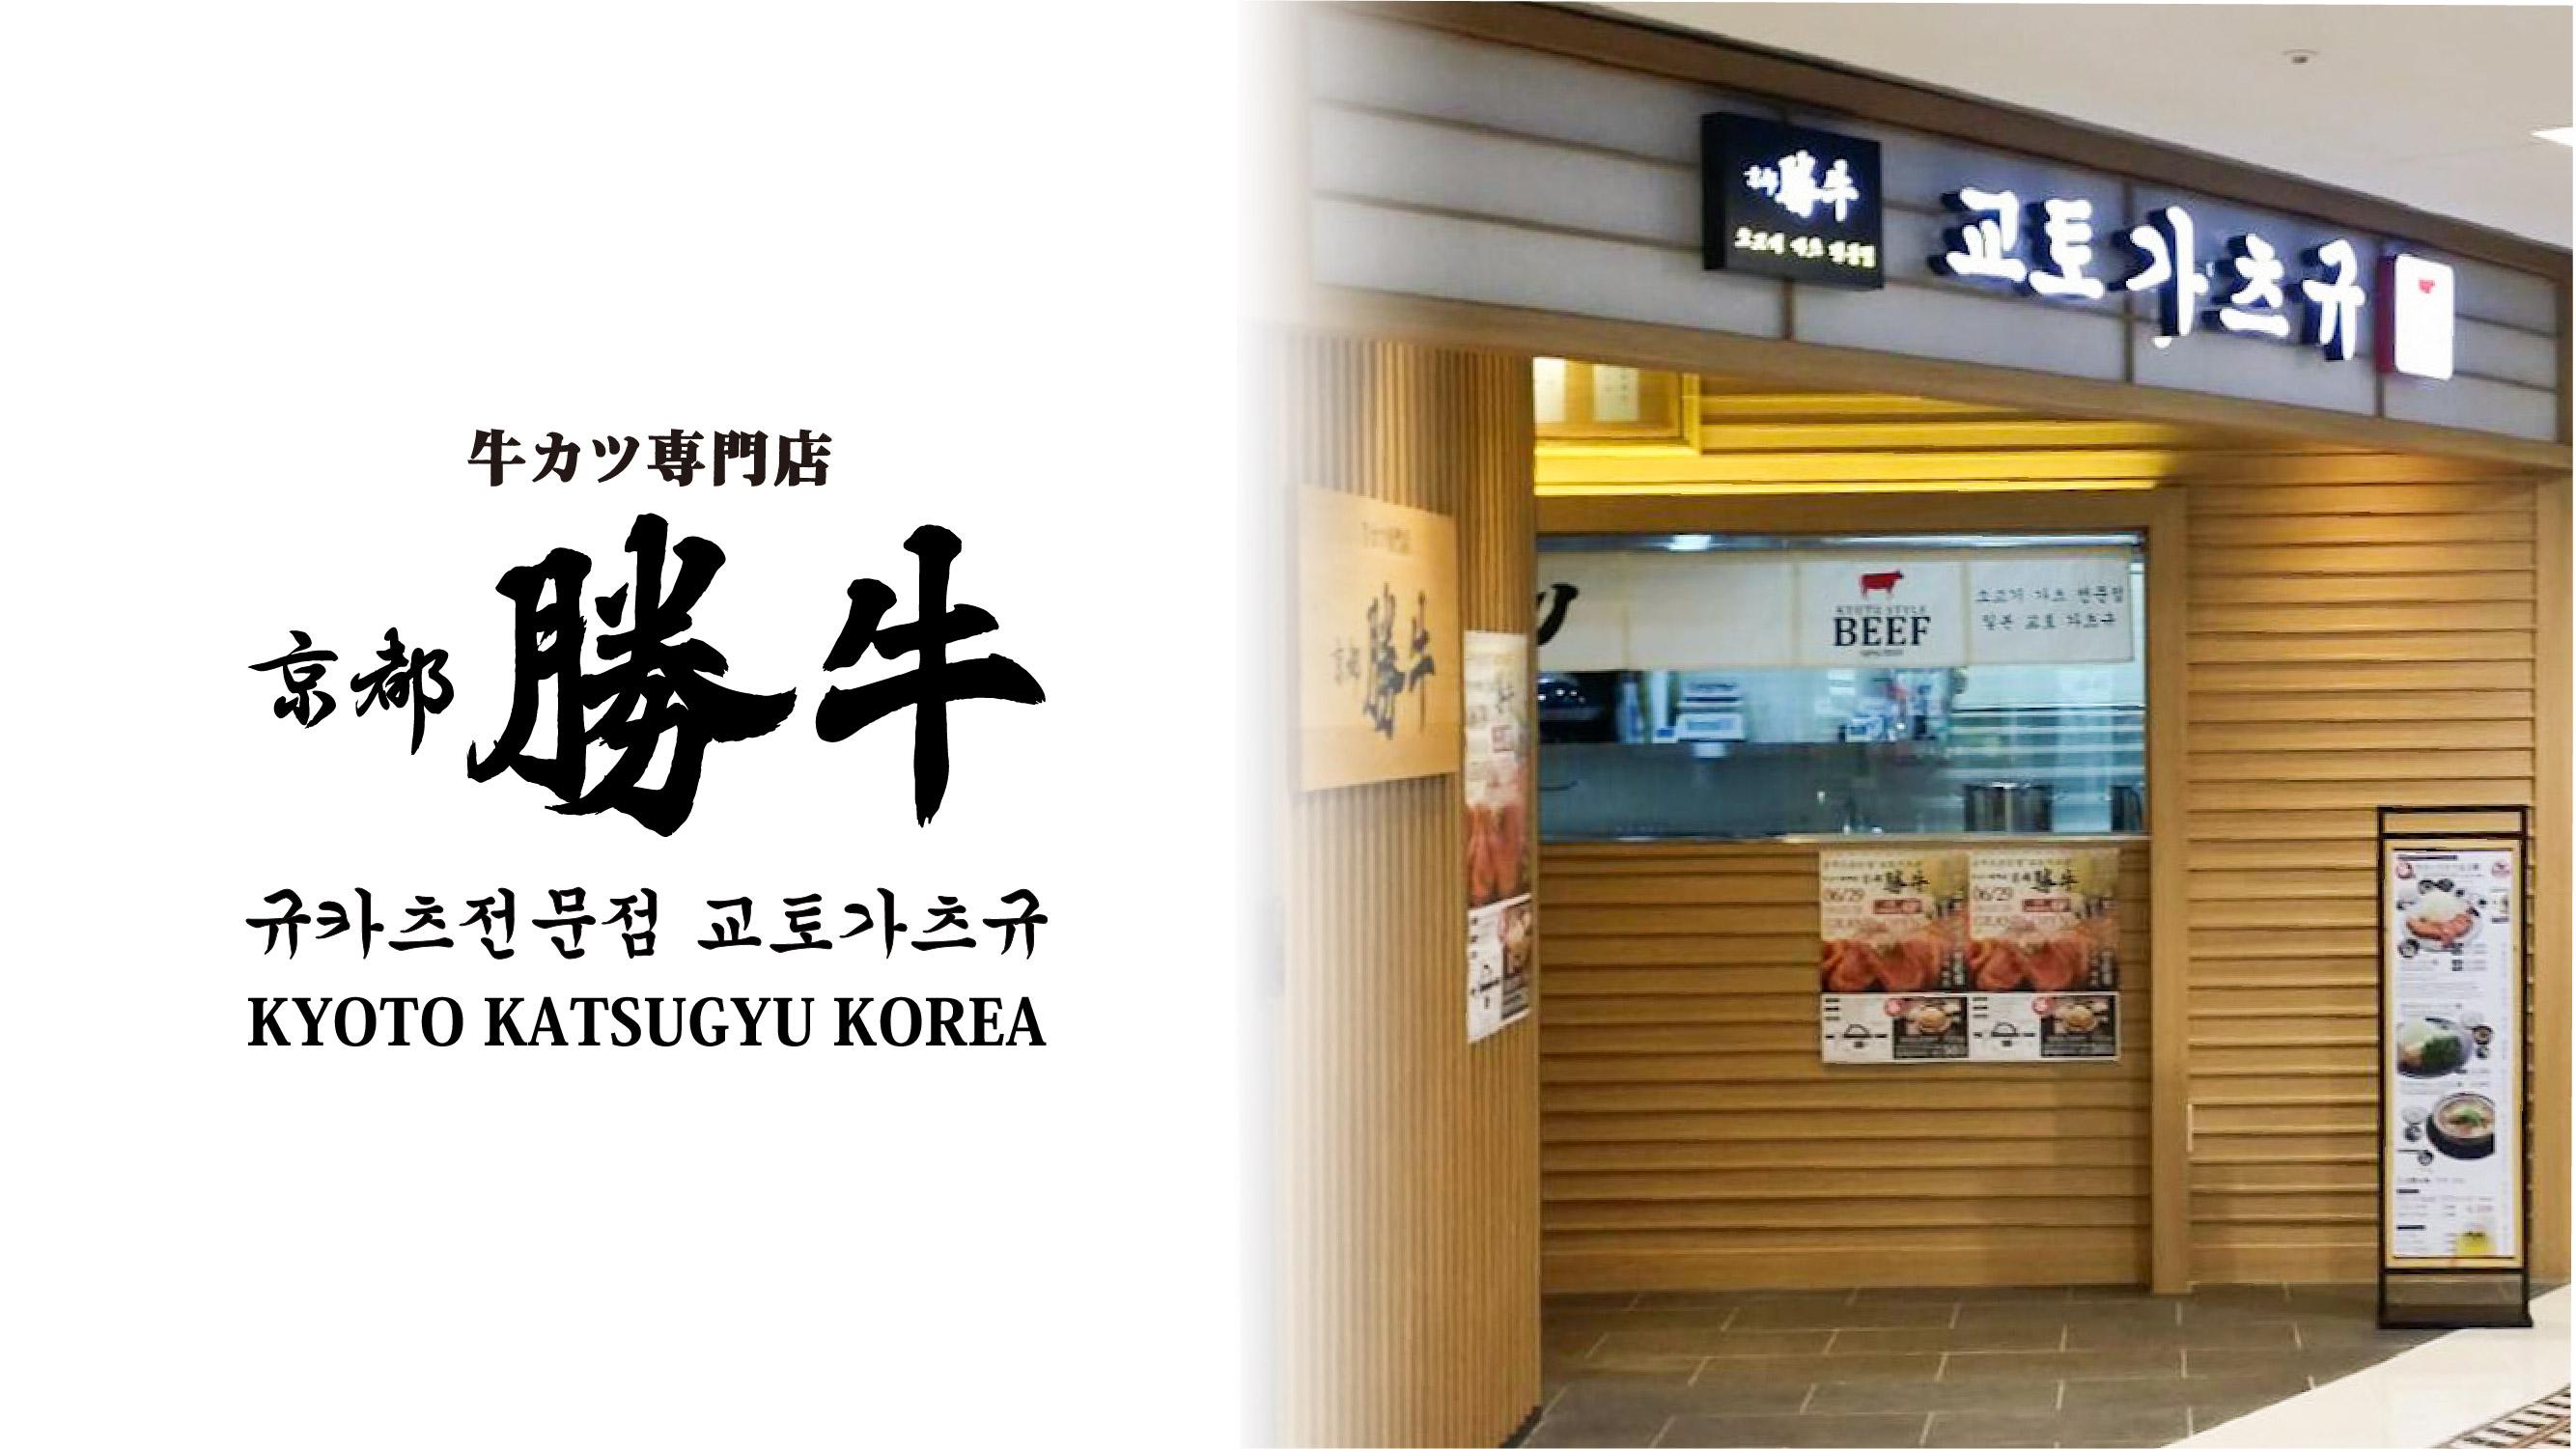 HP更新画像(韓国)8号店-01